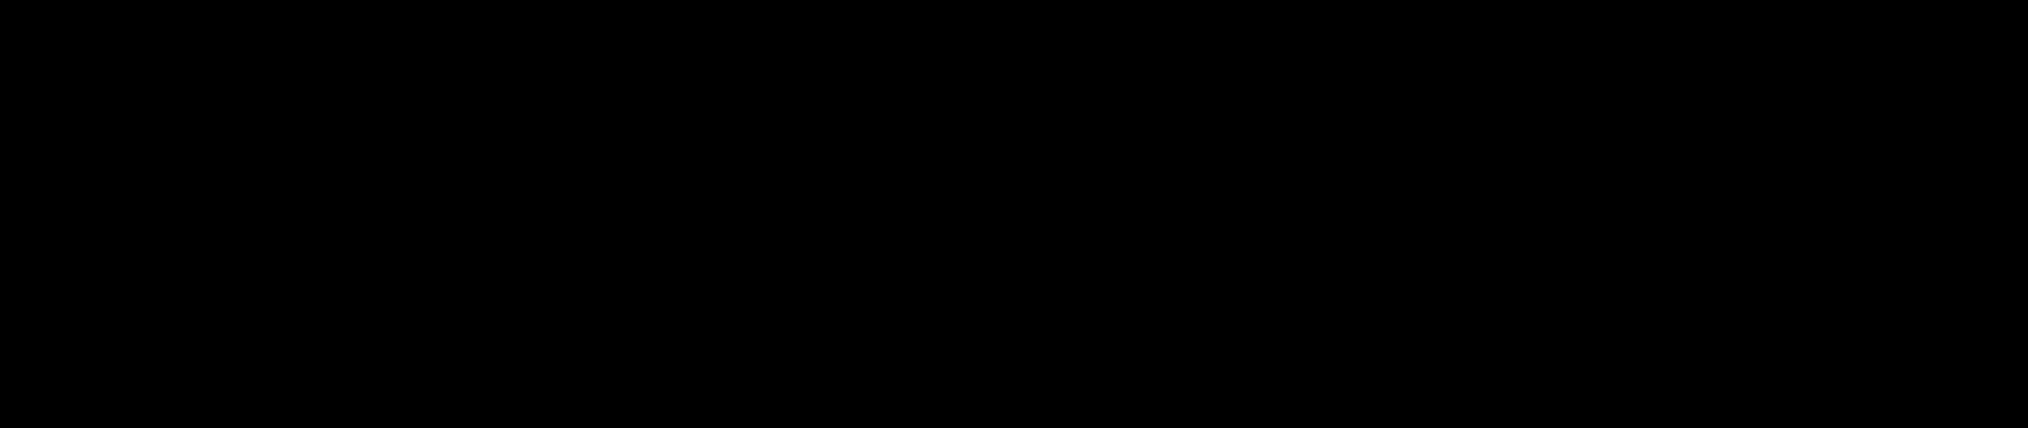 1-Bromotetradecane-d<sub>9</sub>